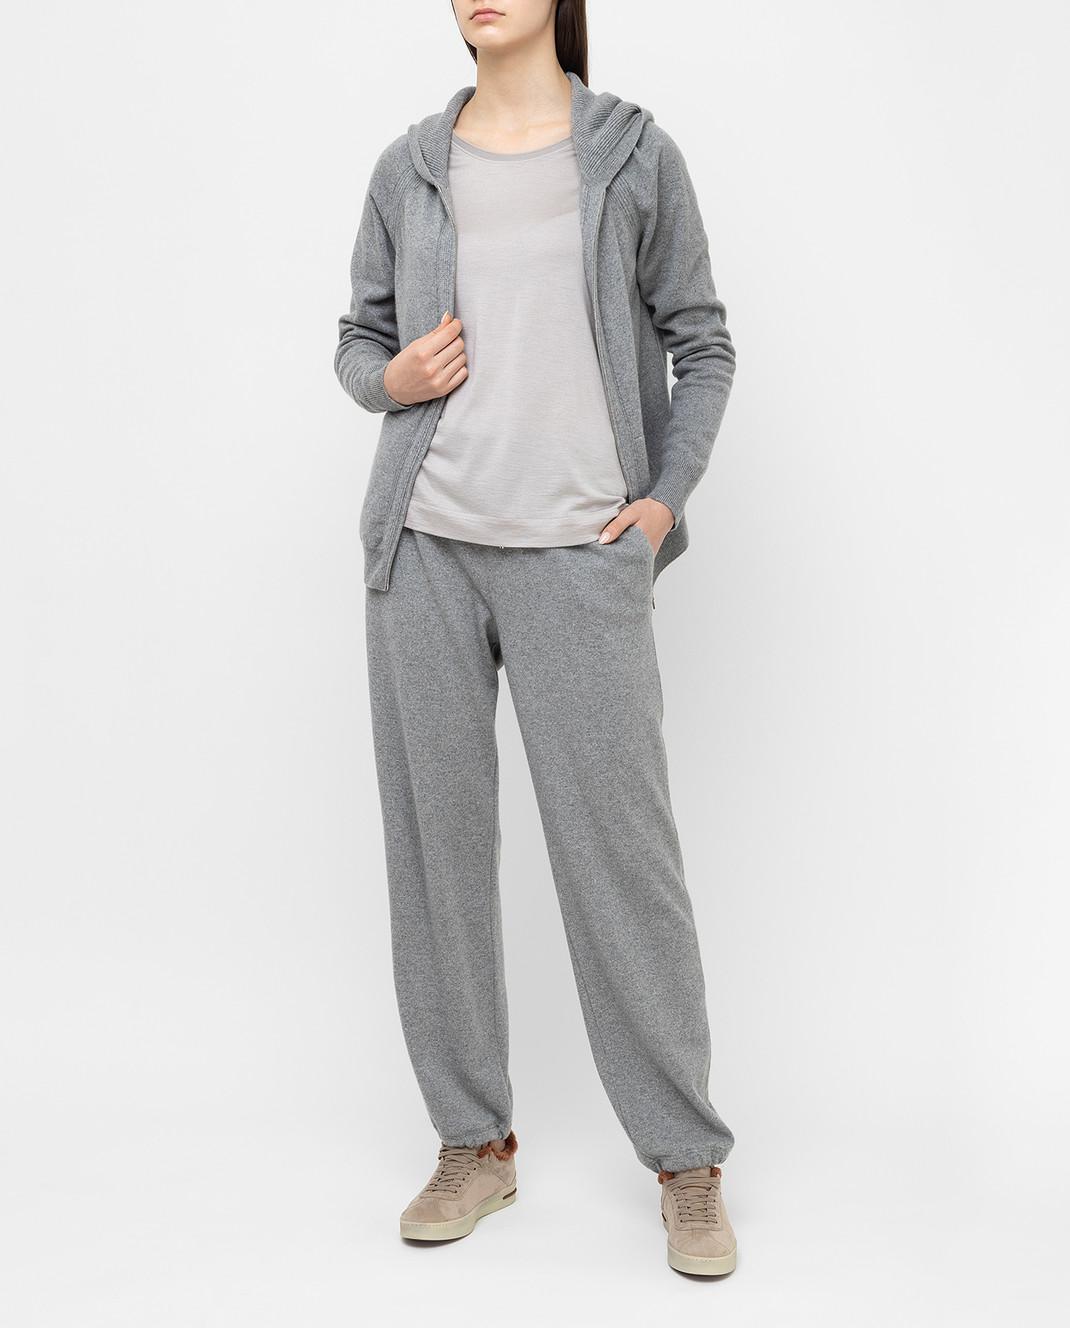 Loro Piana Серый джемпер из кашемира и шелка F2FAE5730 изображение 2